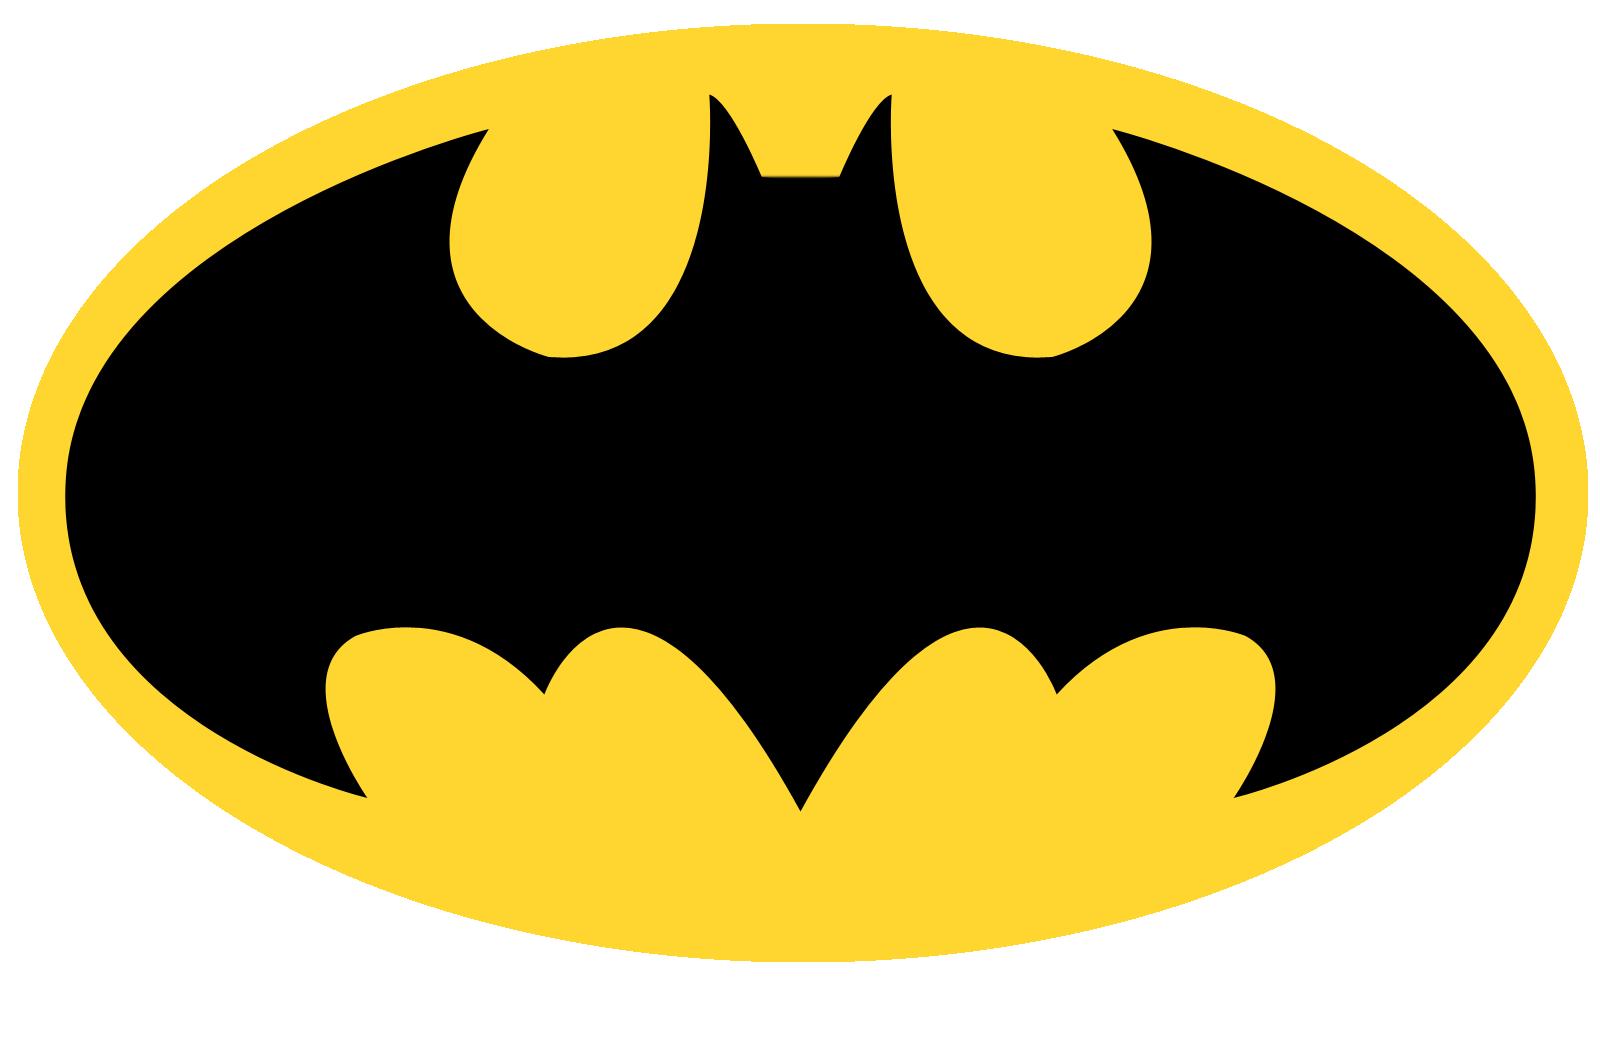 Batman logo by machsabre on deviantart batman logo by machsabre batman logo by machsabre buycottarizona